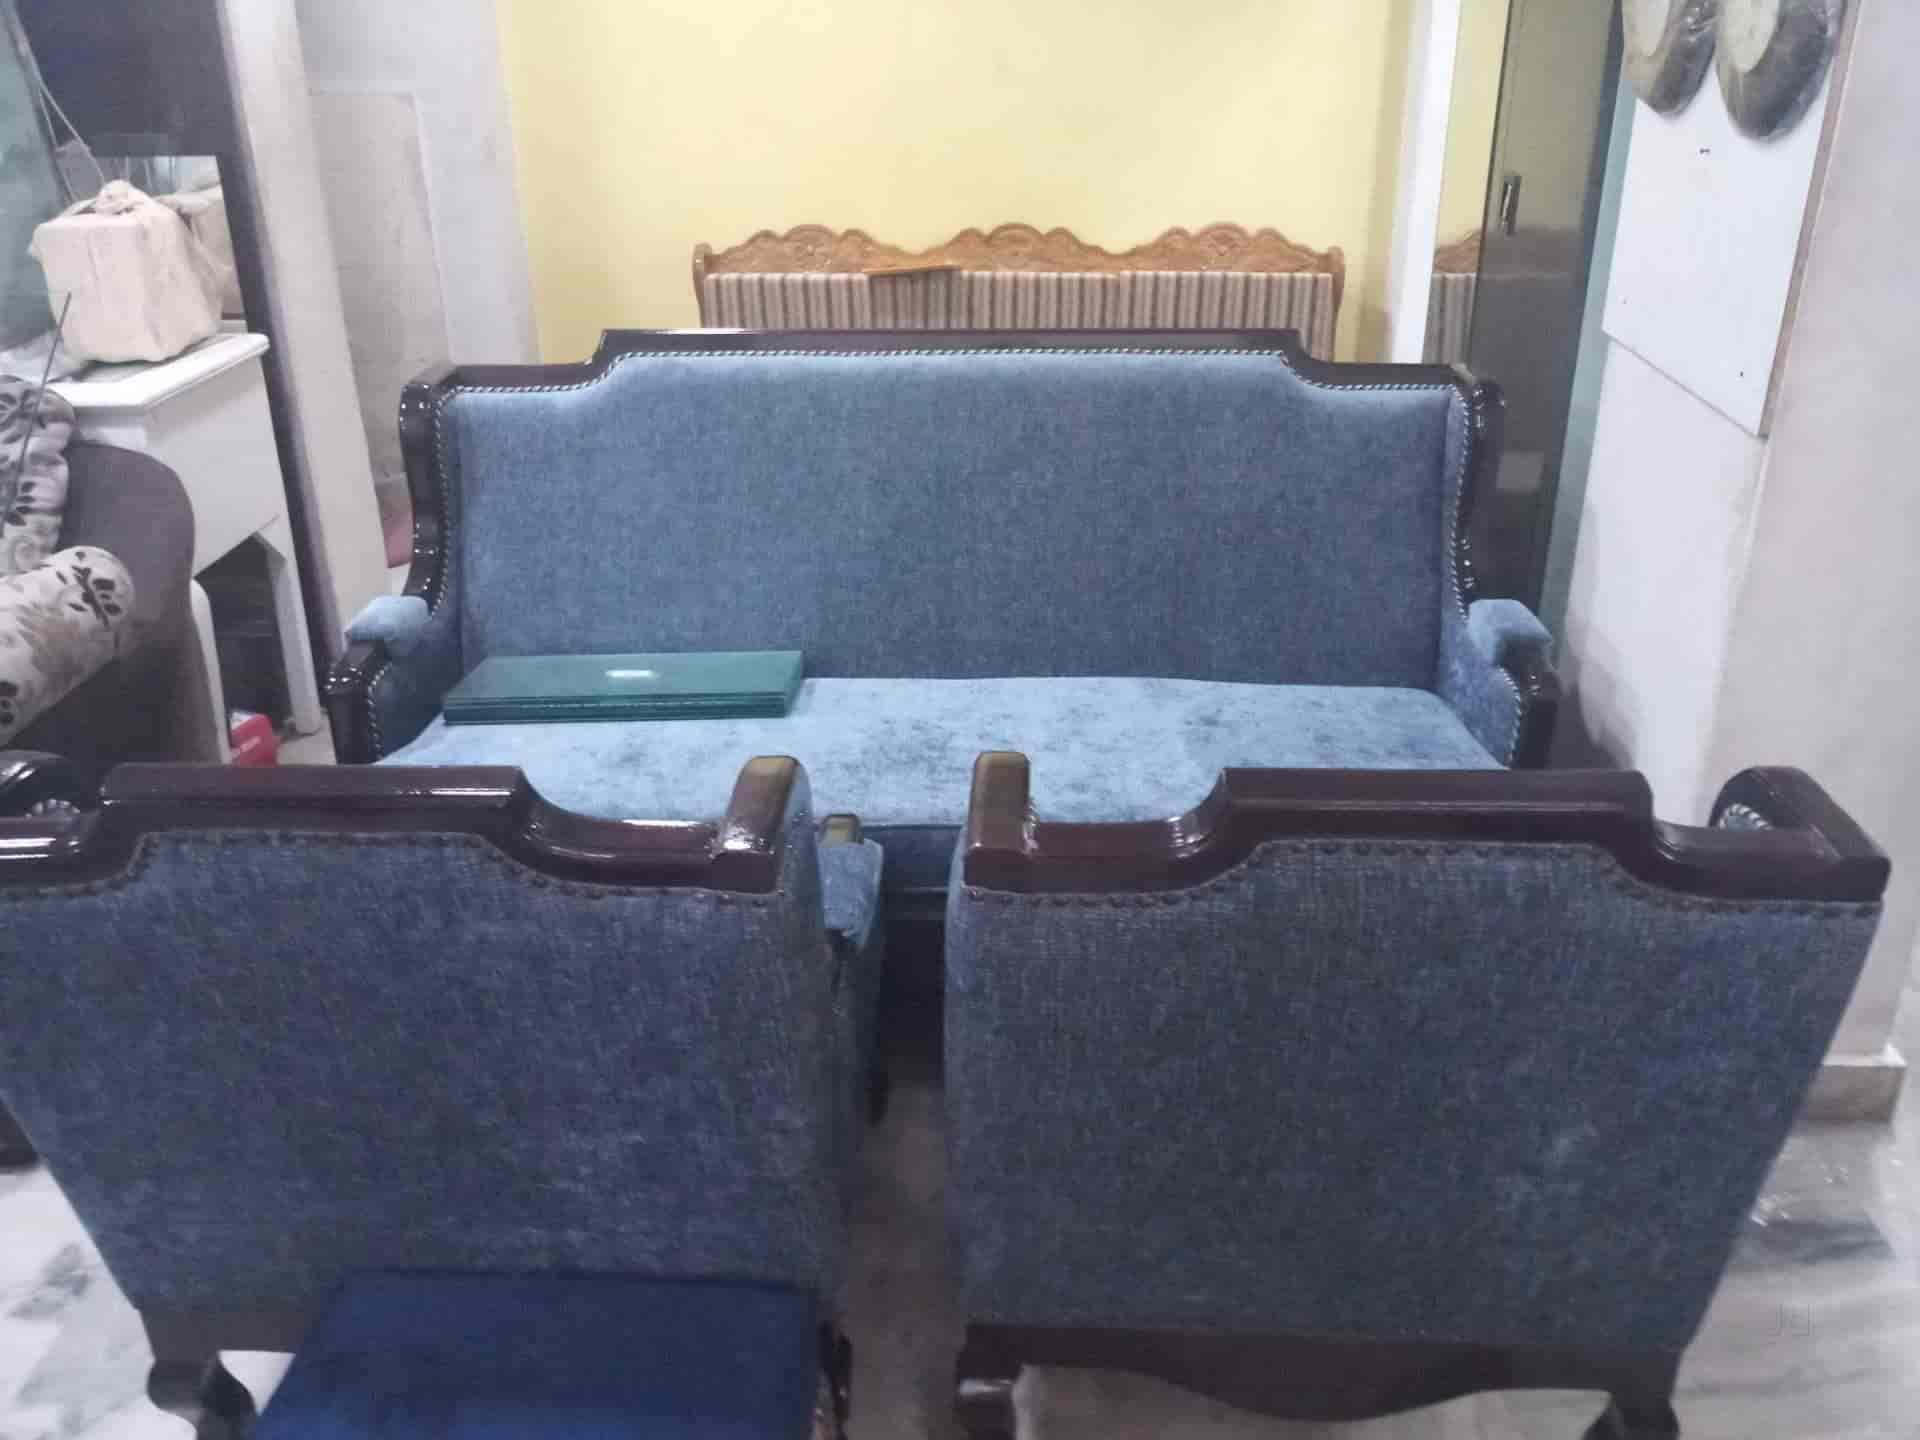 Shree Laxmi Furniture, Siwanchi Gate - Furniture Dealers in Jodhpur ...